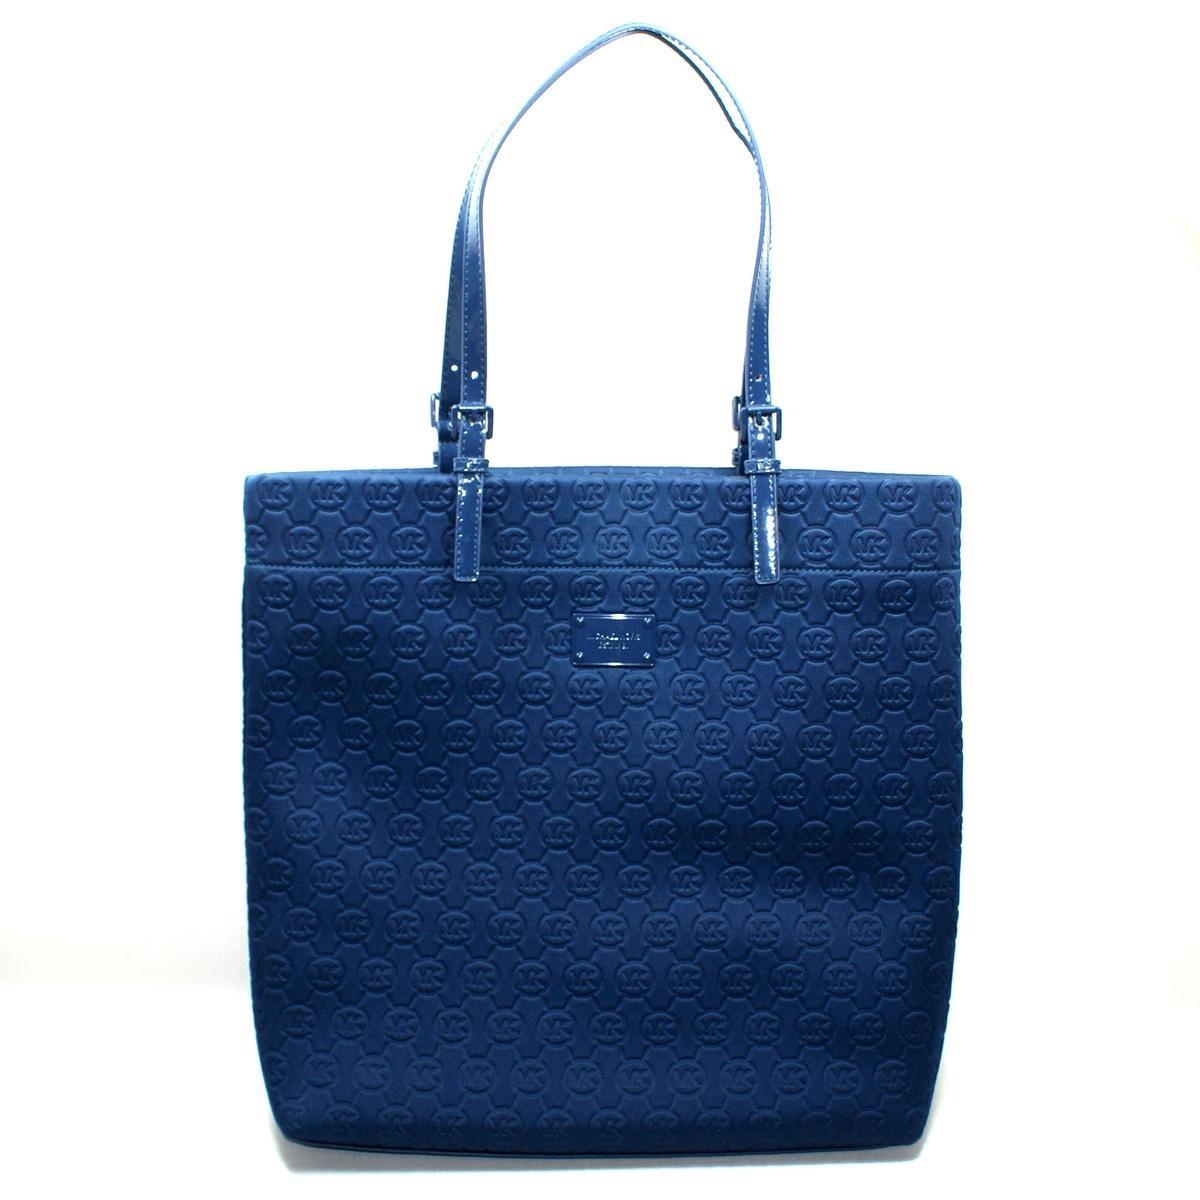 6eaf9fdcc4e6 Home · Michael Kors · Neoprene Navy Blue Jet Set Tote Bag. CLICK THUMBNAIL  TO ZOOM. Found In: Handbags